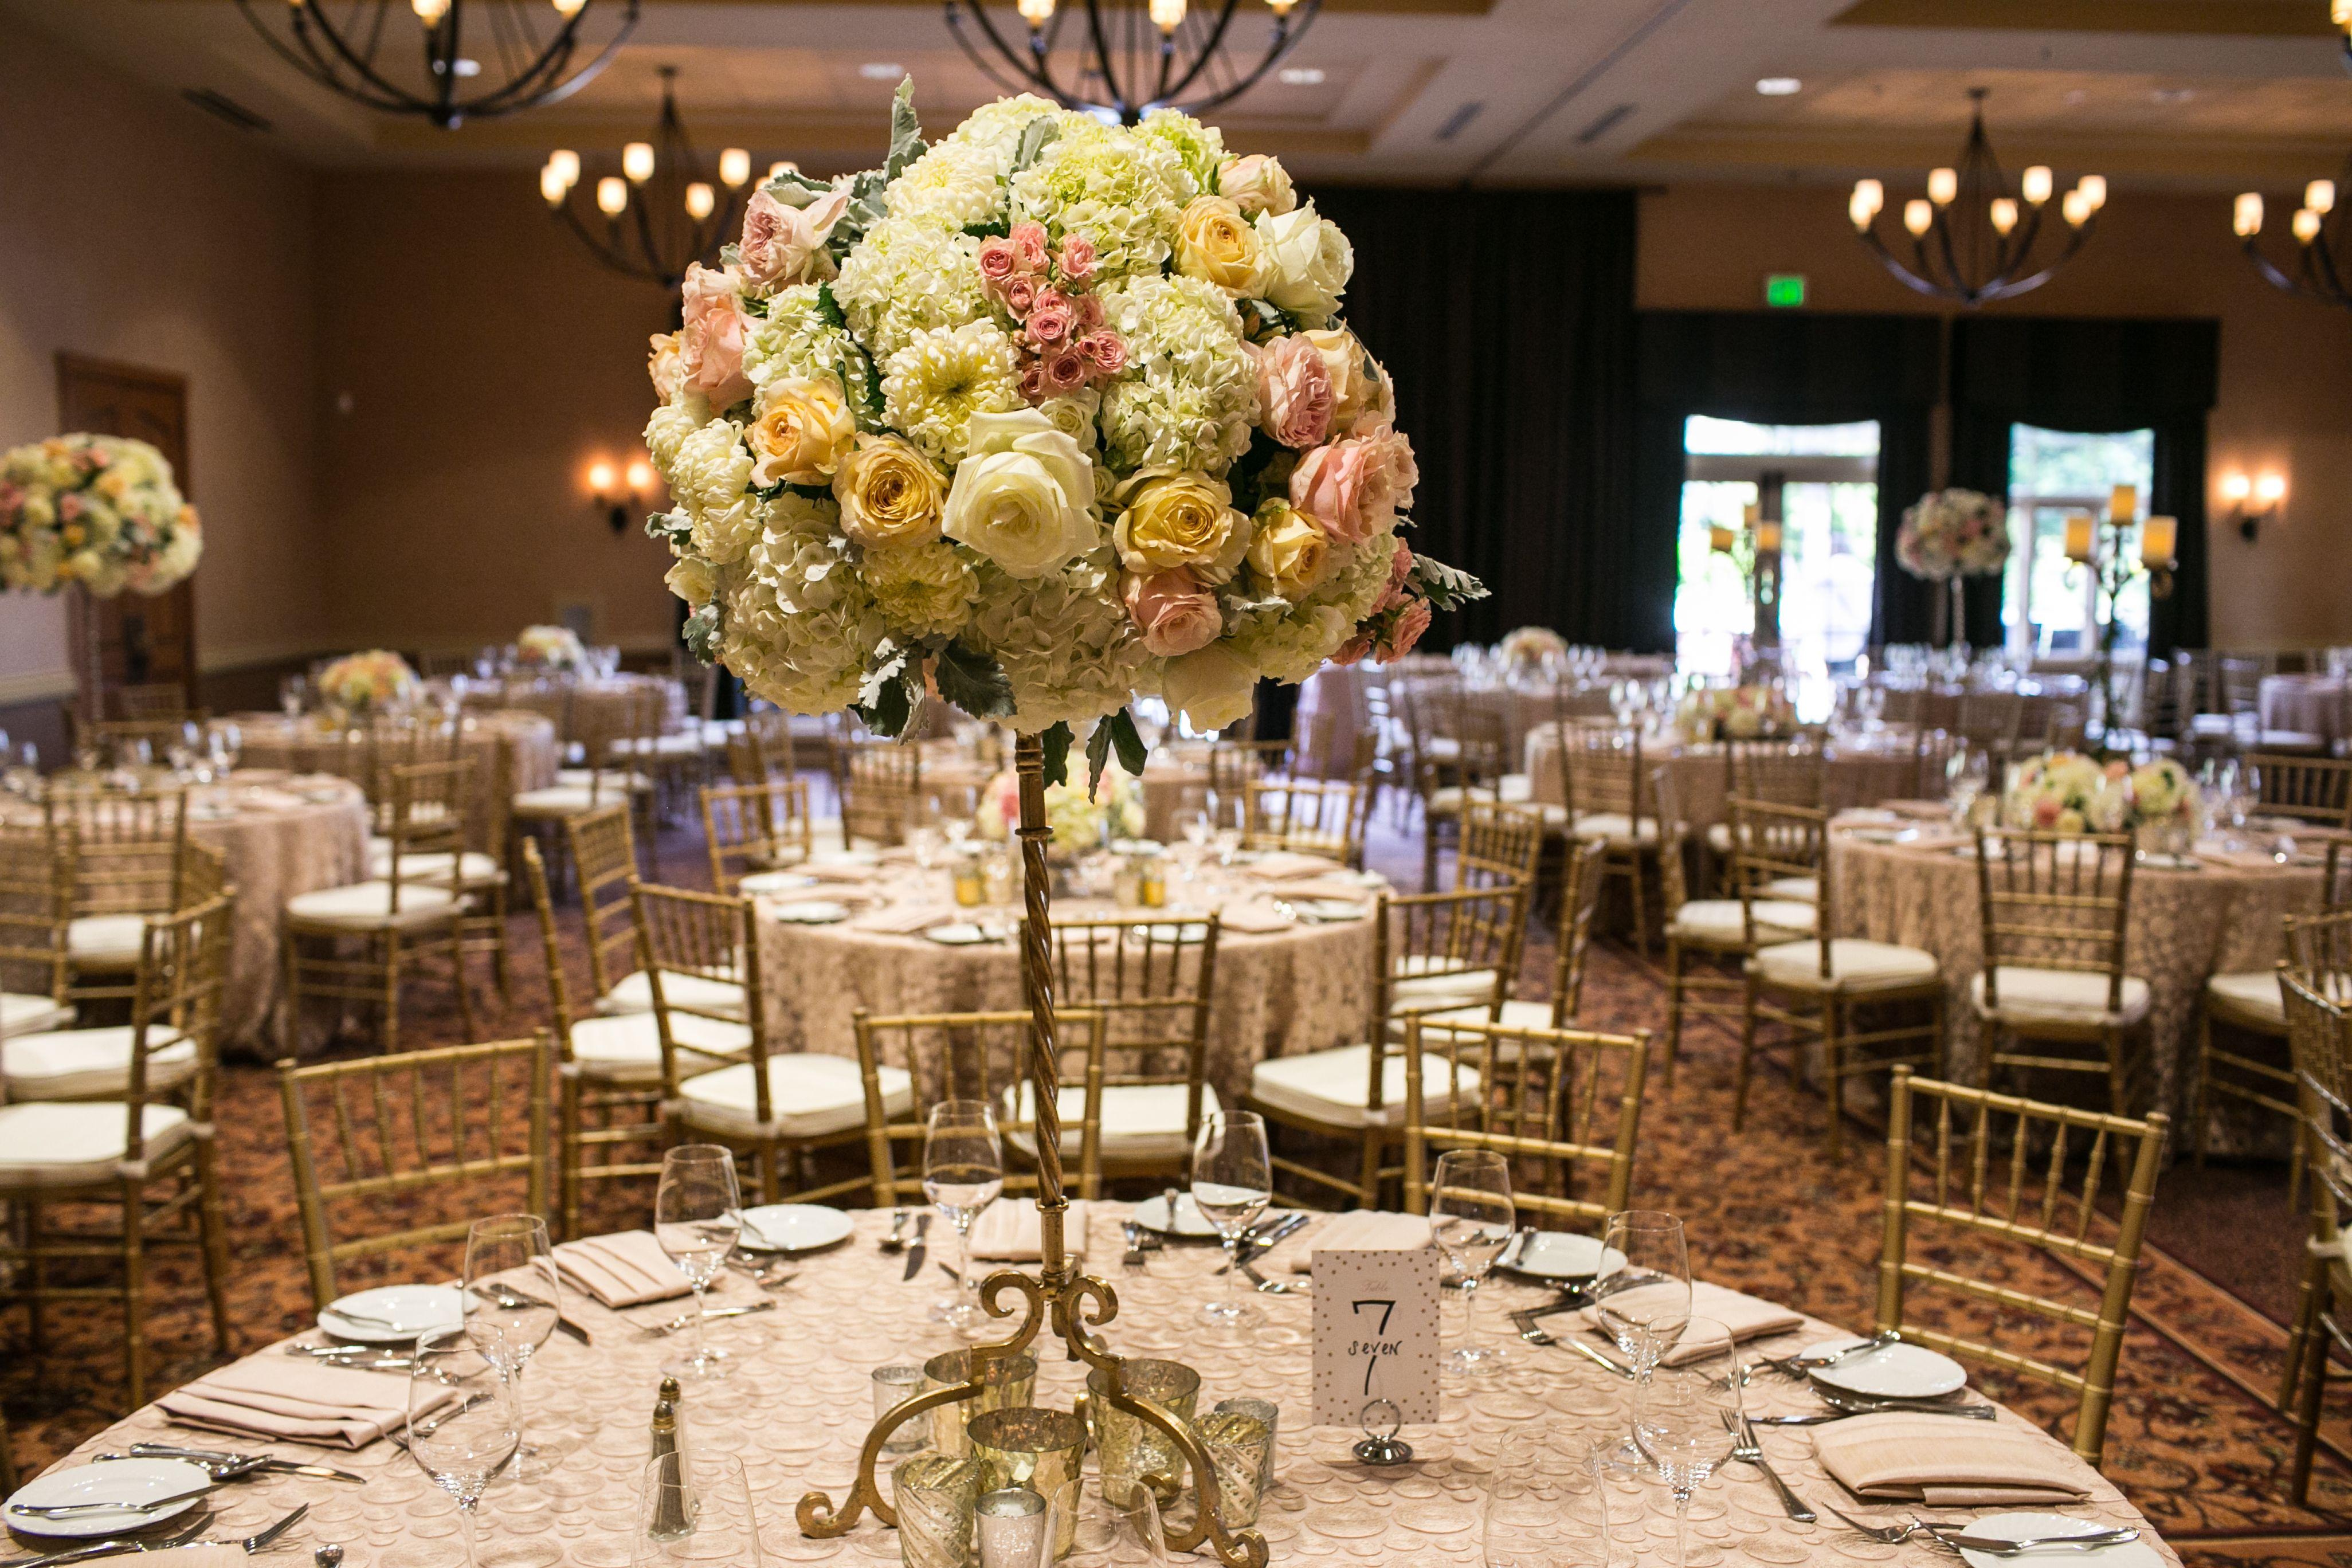 Gold Candelabra Fls Designed By Anita Wine Country Flowers Vintners Inn Wedding Reception Rose Ballroom